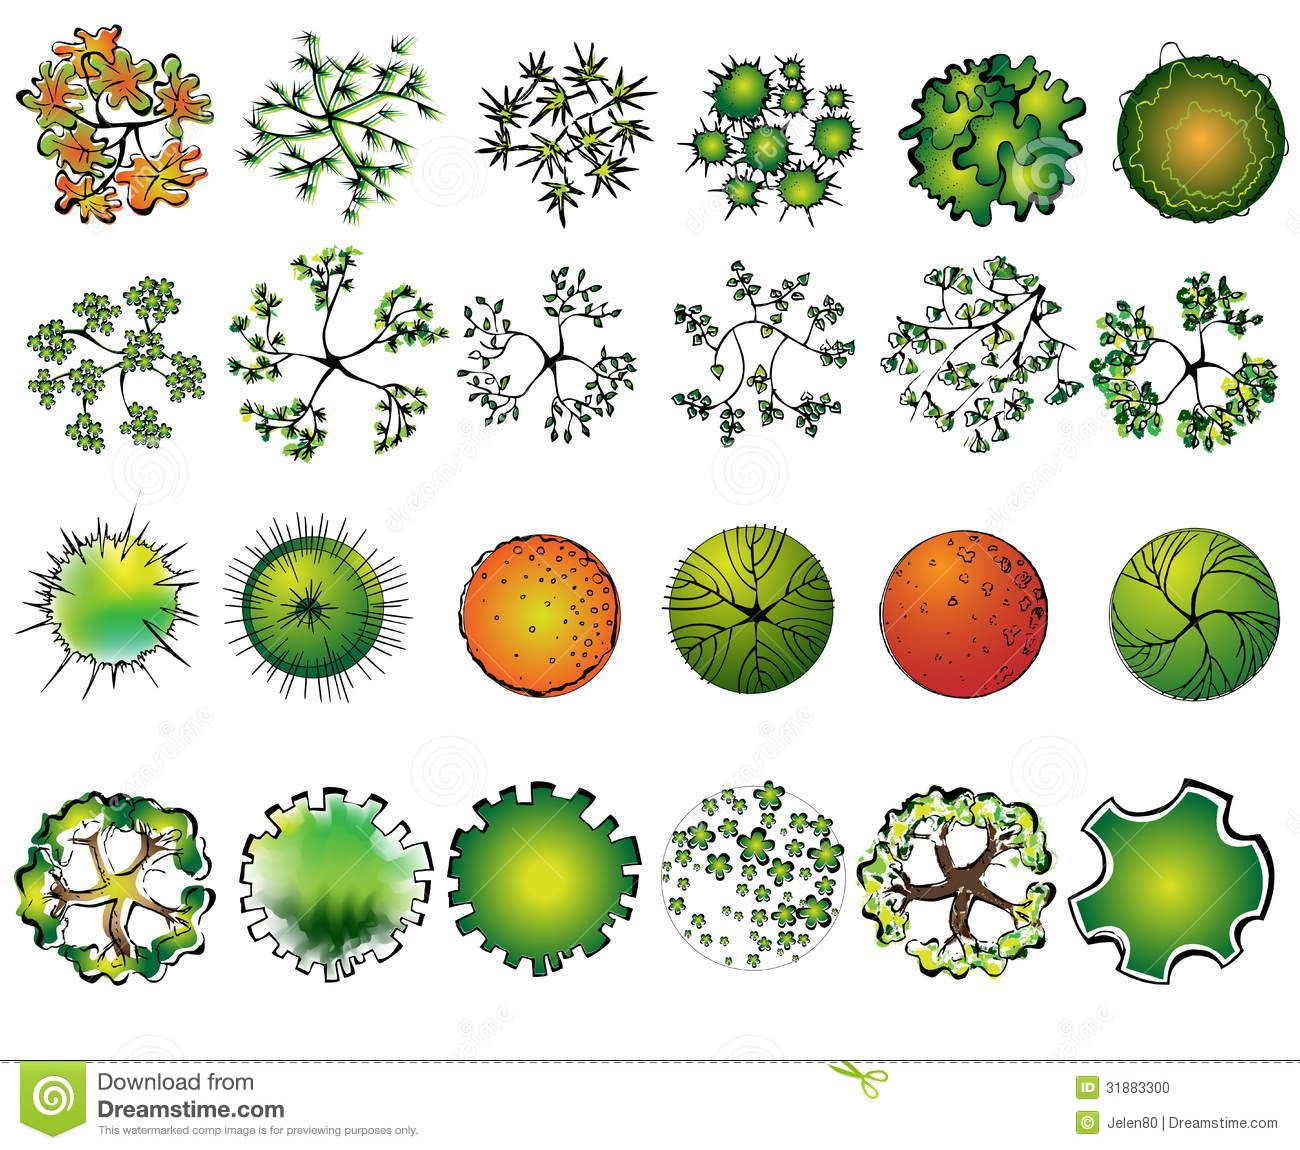 Illustration About A Set Of Colored Treetop Symbols For Architectural Or Landscape De Landscape Design Drawings Landscape Design Landscape Architecture Design